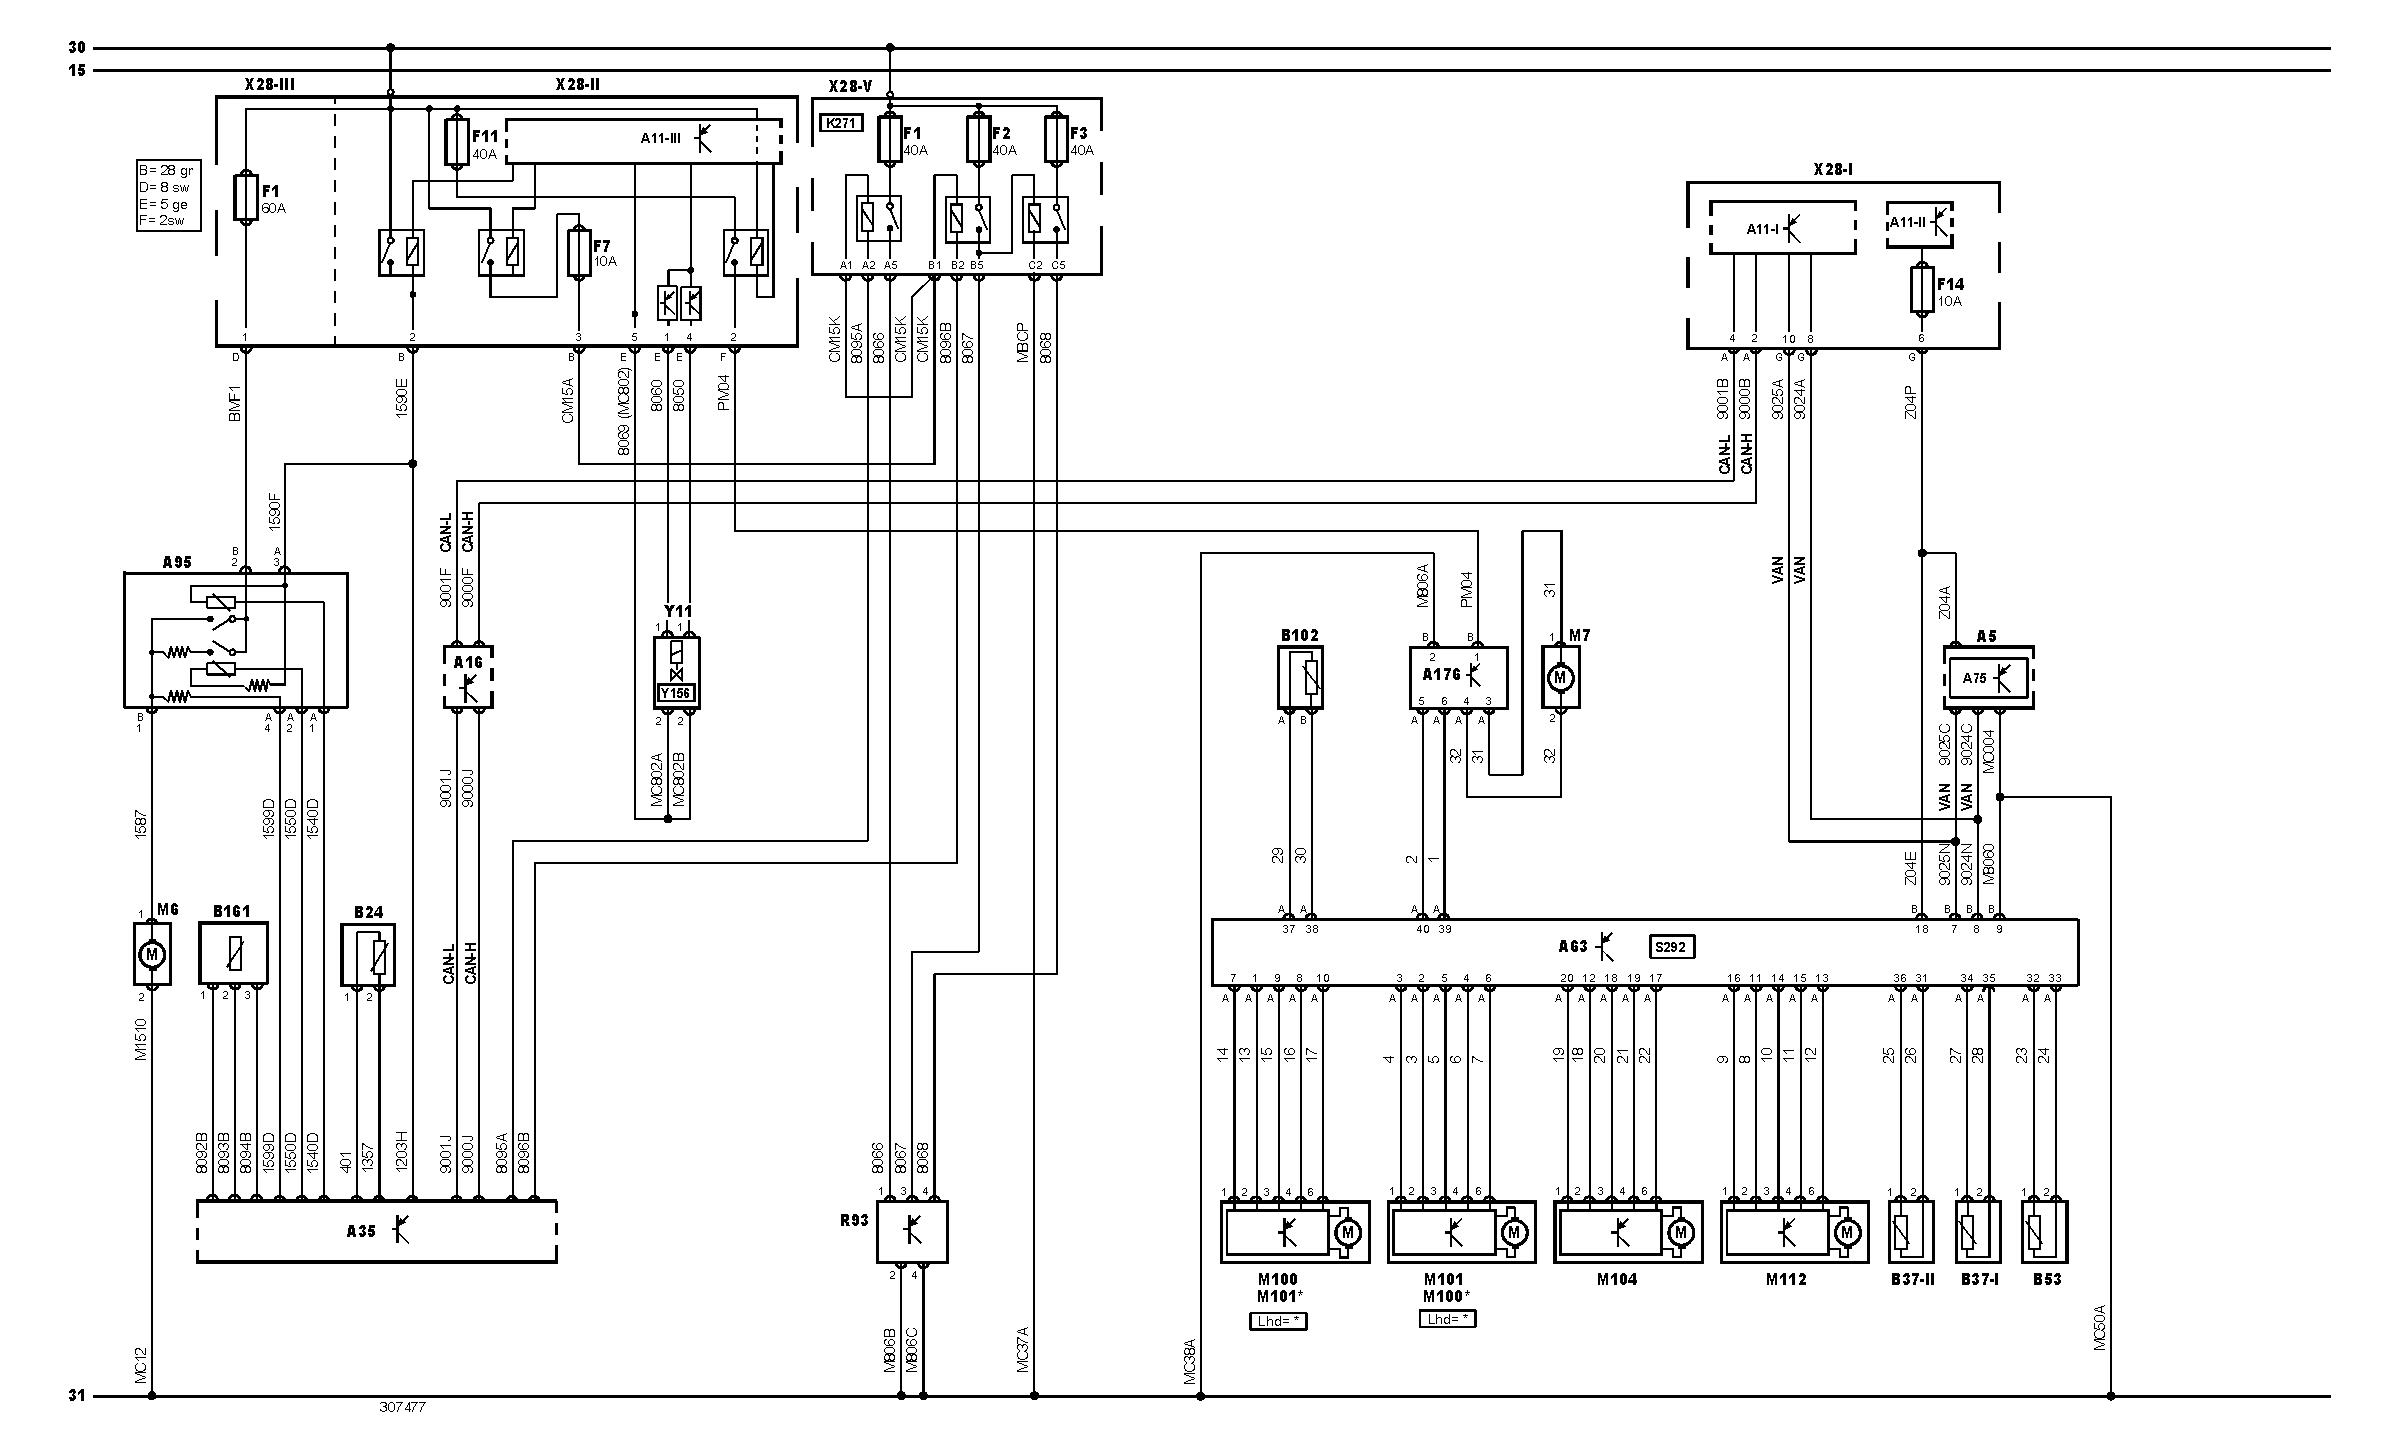 peugeot 406 wiring diagram    peugeot    207 schemat elektryczny climatronika elektroda pl     peugeot    207 schemat elektryczny climatronika elektroda pl